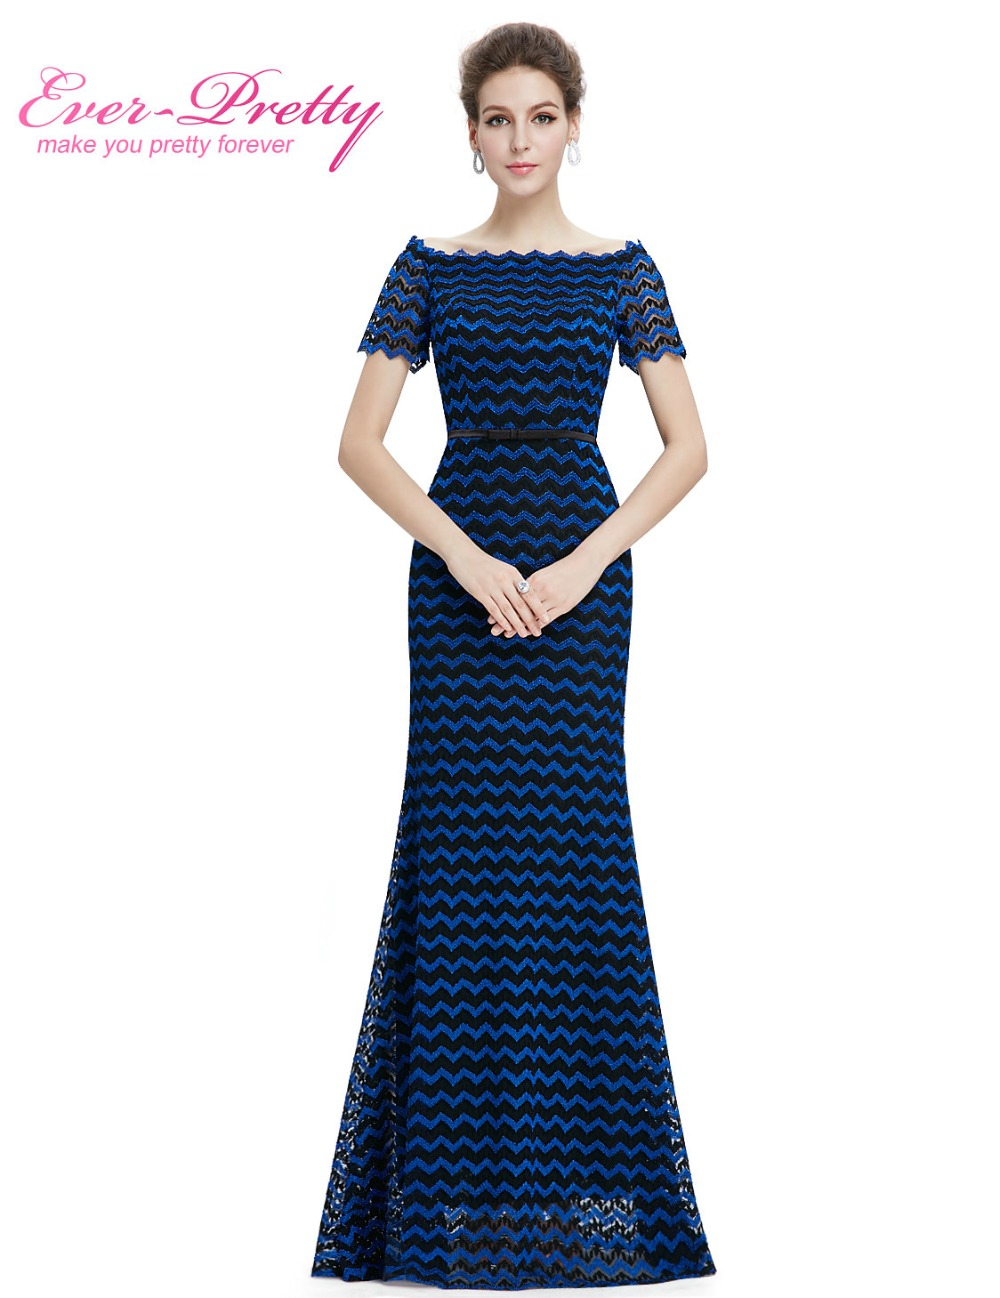 Mother of the Bride Dresses Ever Pretty EP08775 2018 Women Elegant Leaf  Sleeve Design Cap Sleeve Mother of the Bride Dresses-in Mother of the Bride  Dresses ... 837c14b3b902